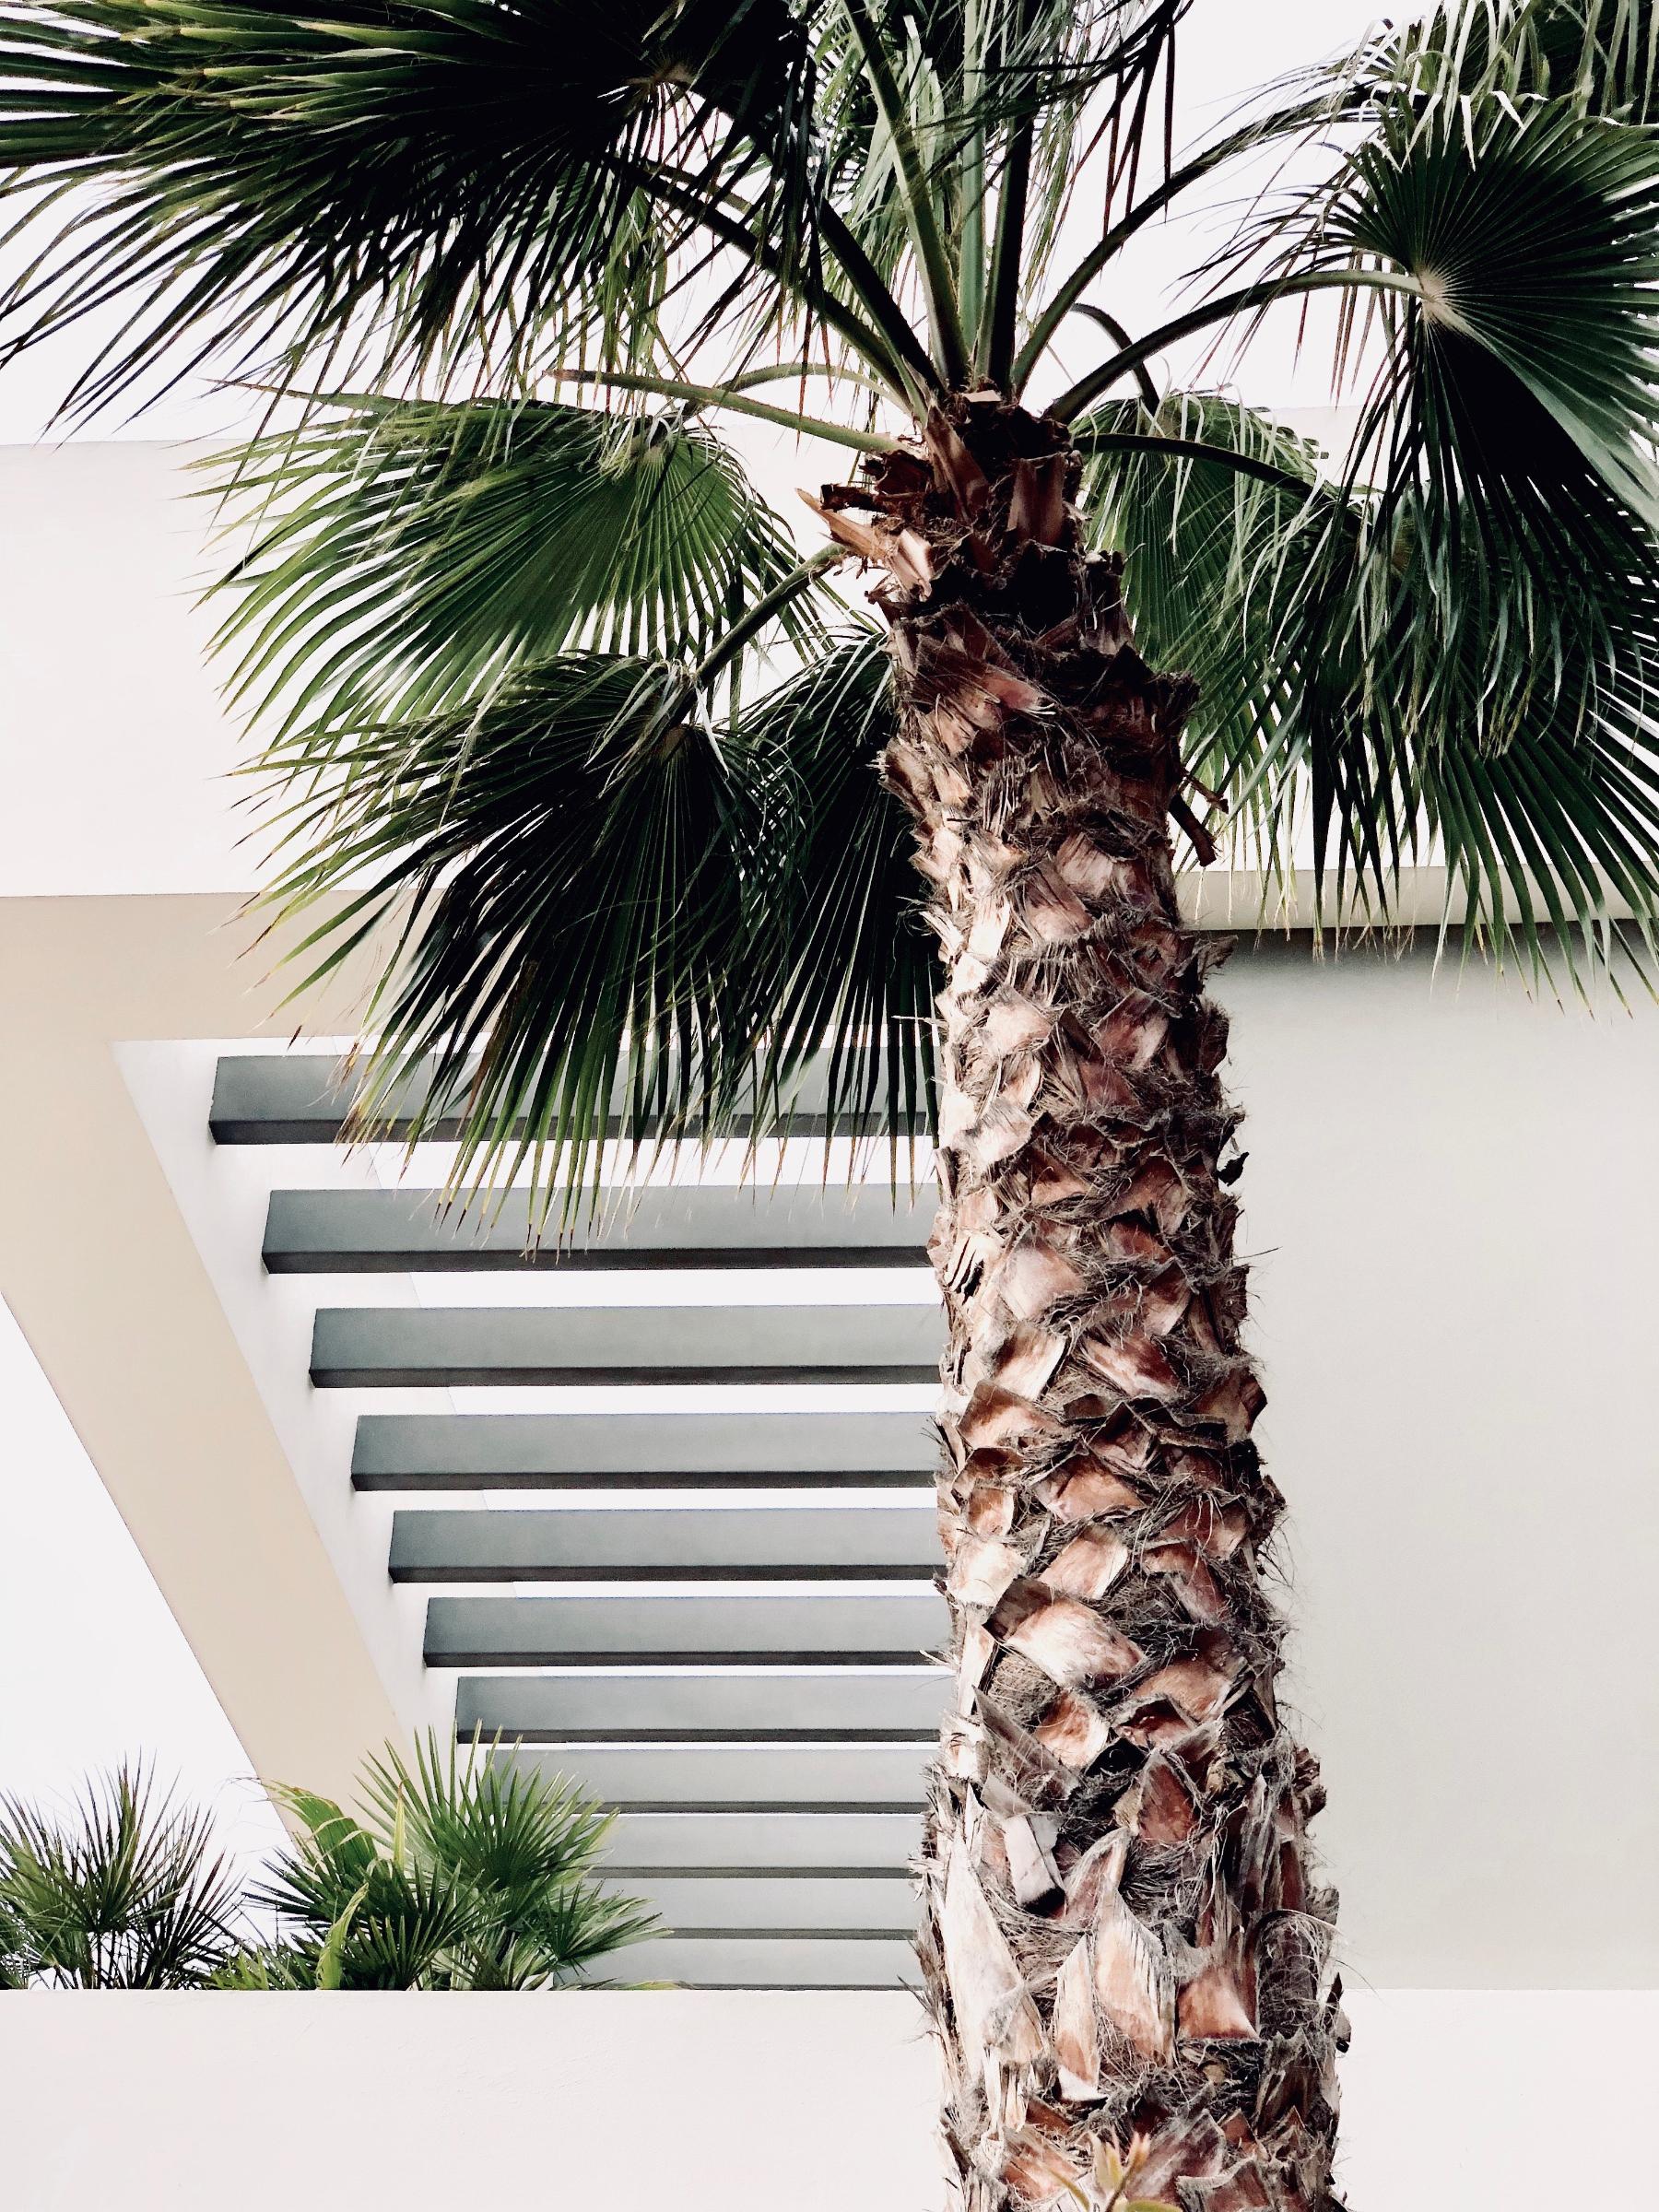 palm_tree_pruning_tips.jpg